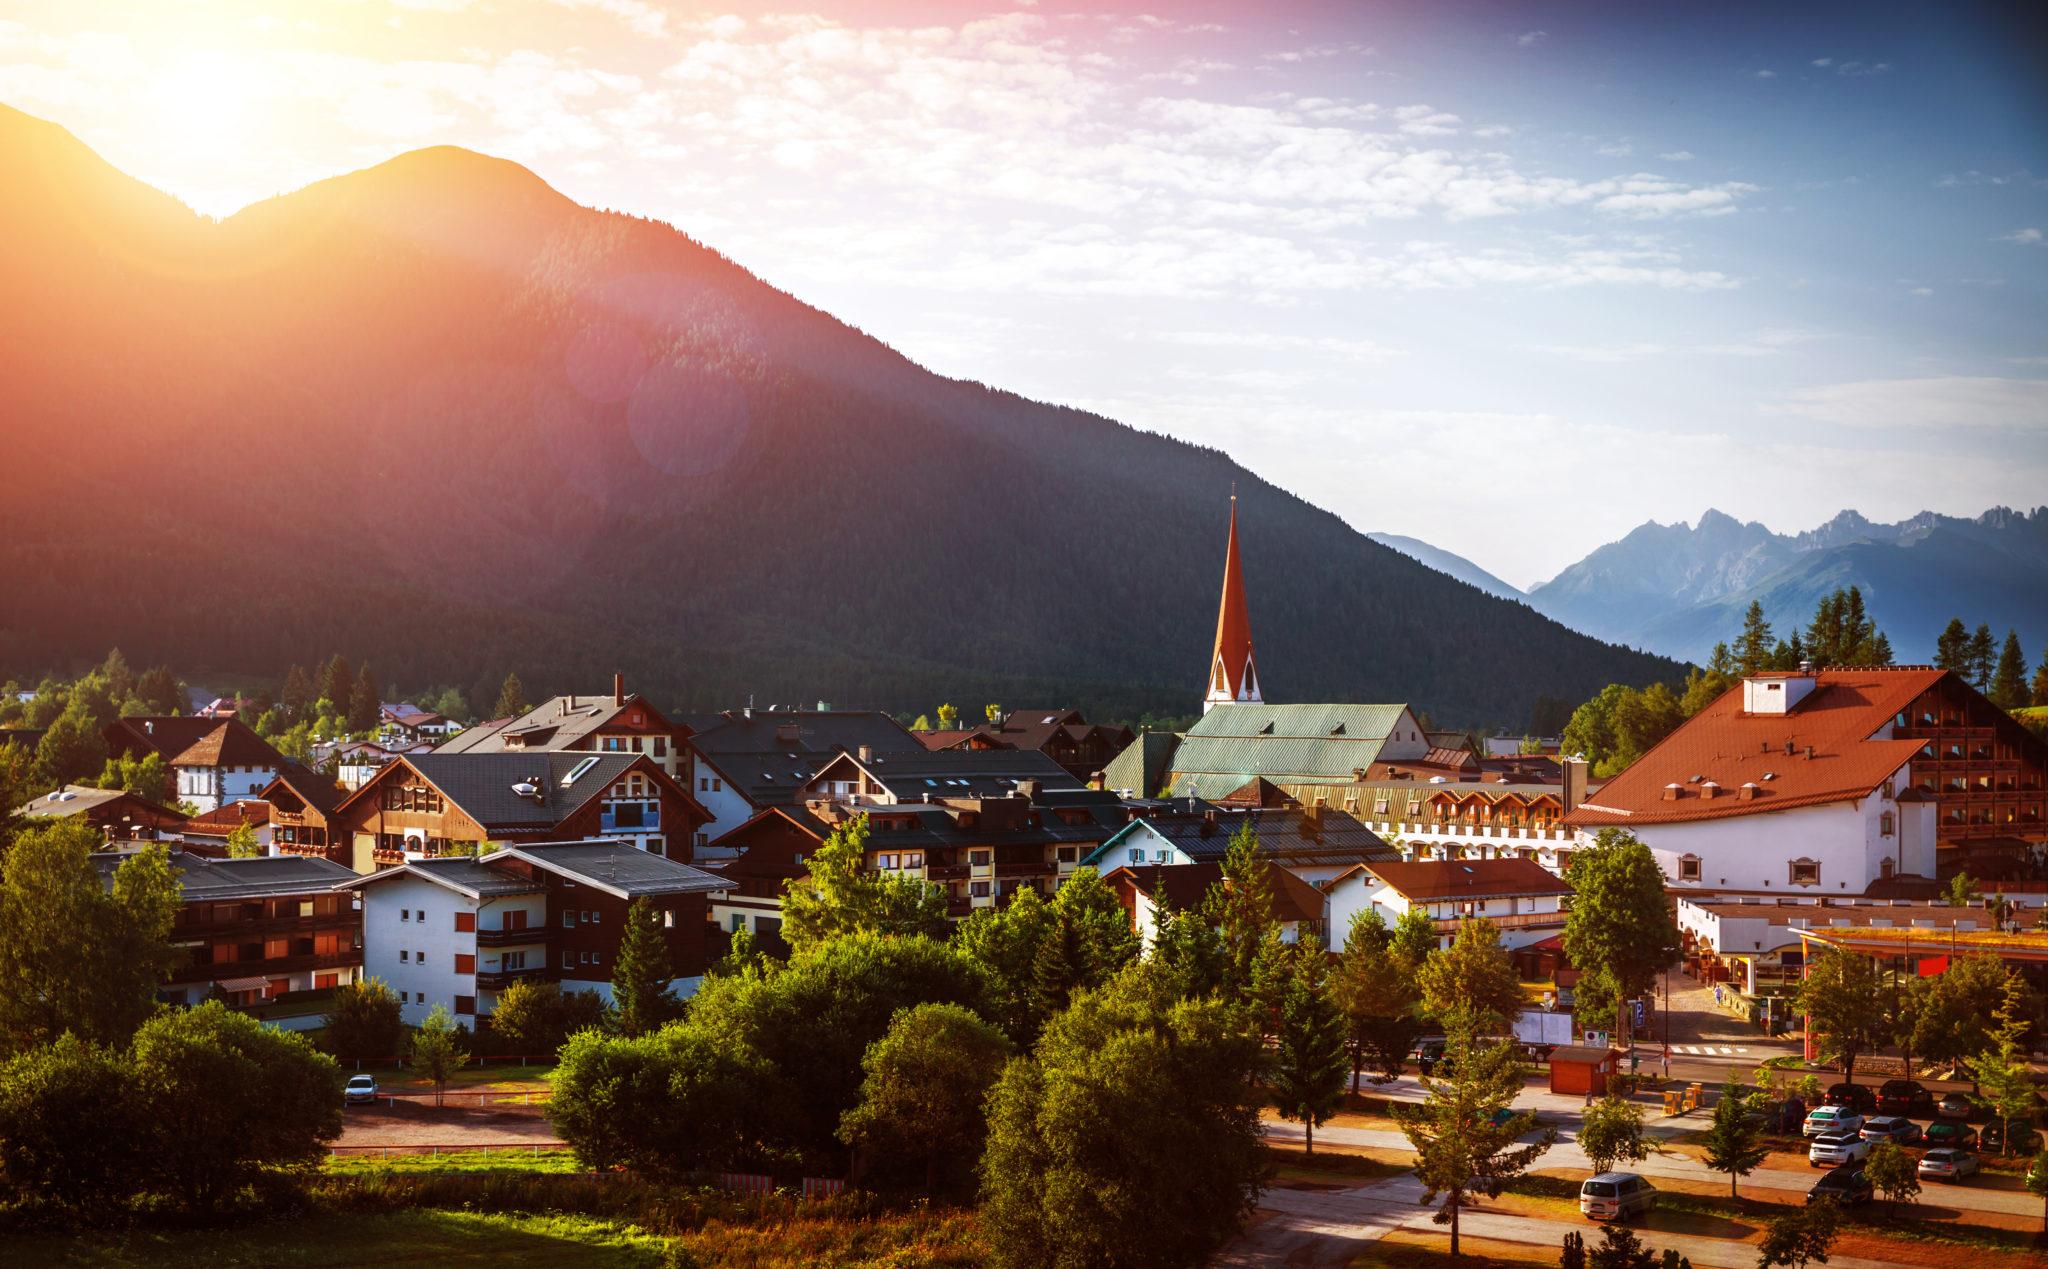 Sonnenuntergang im August in Seefeld